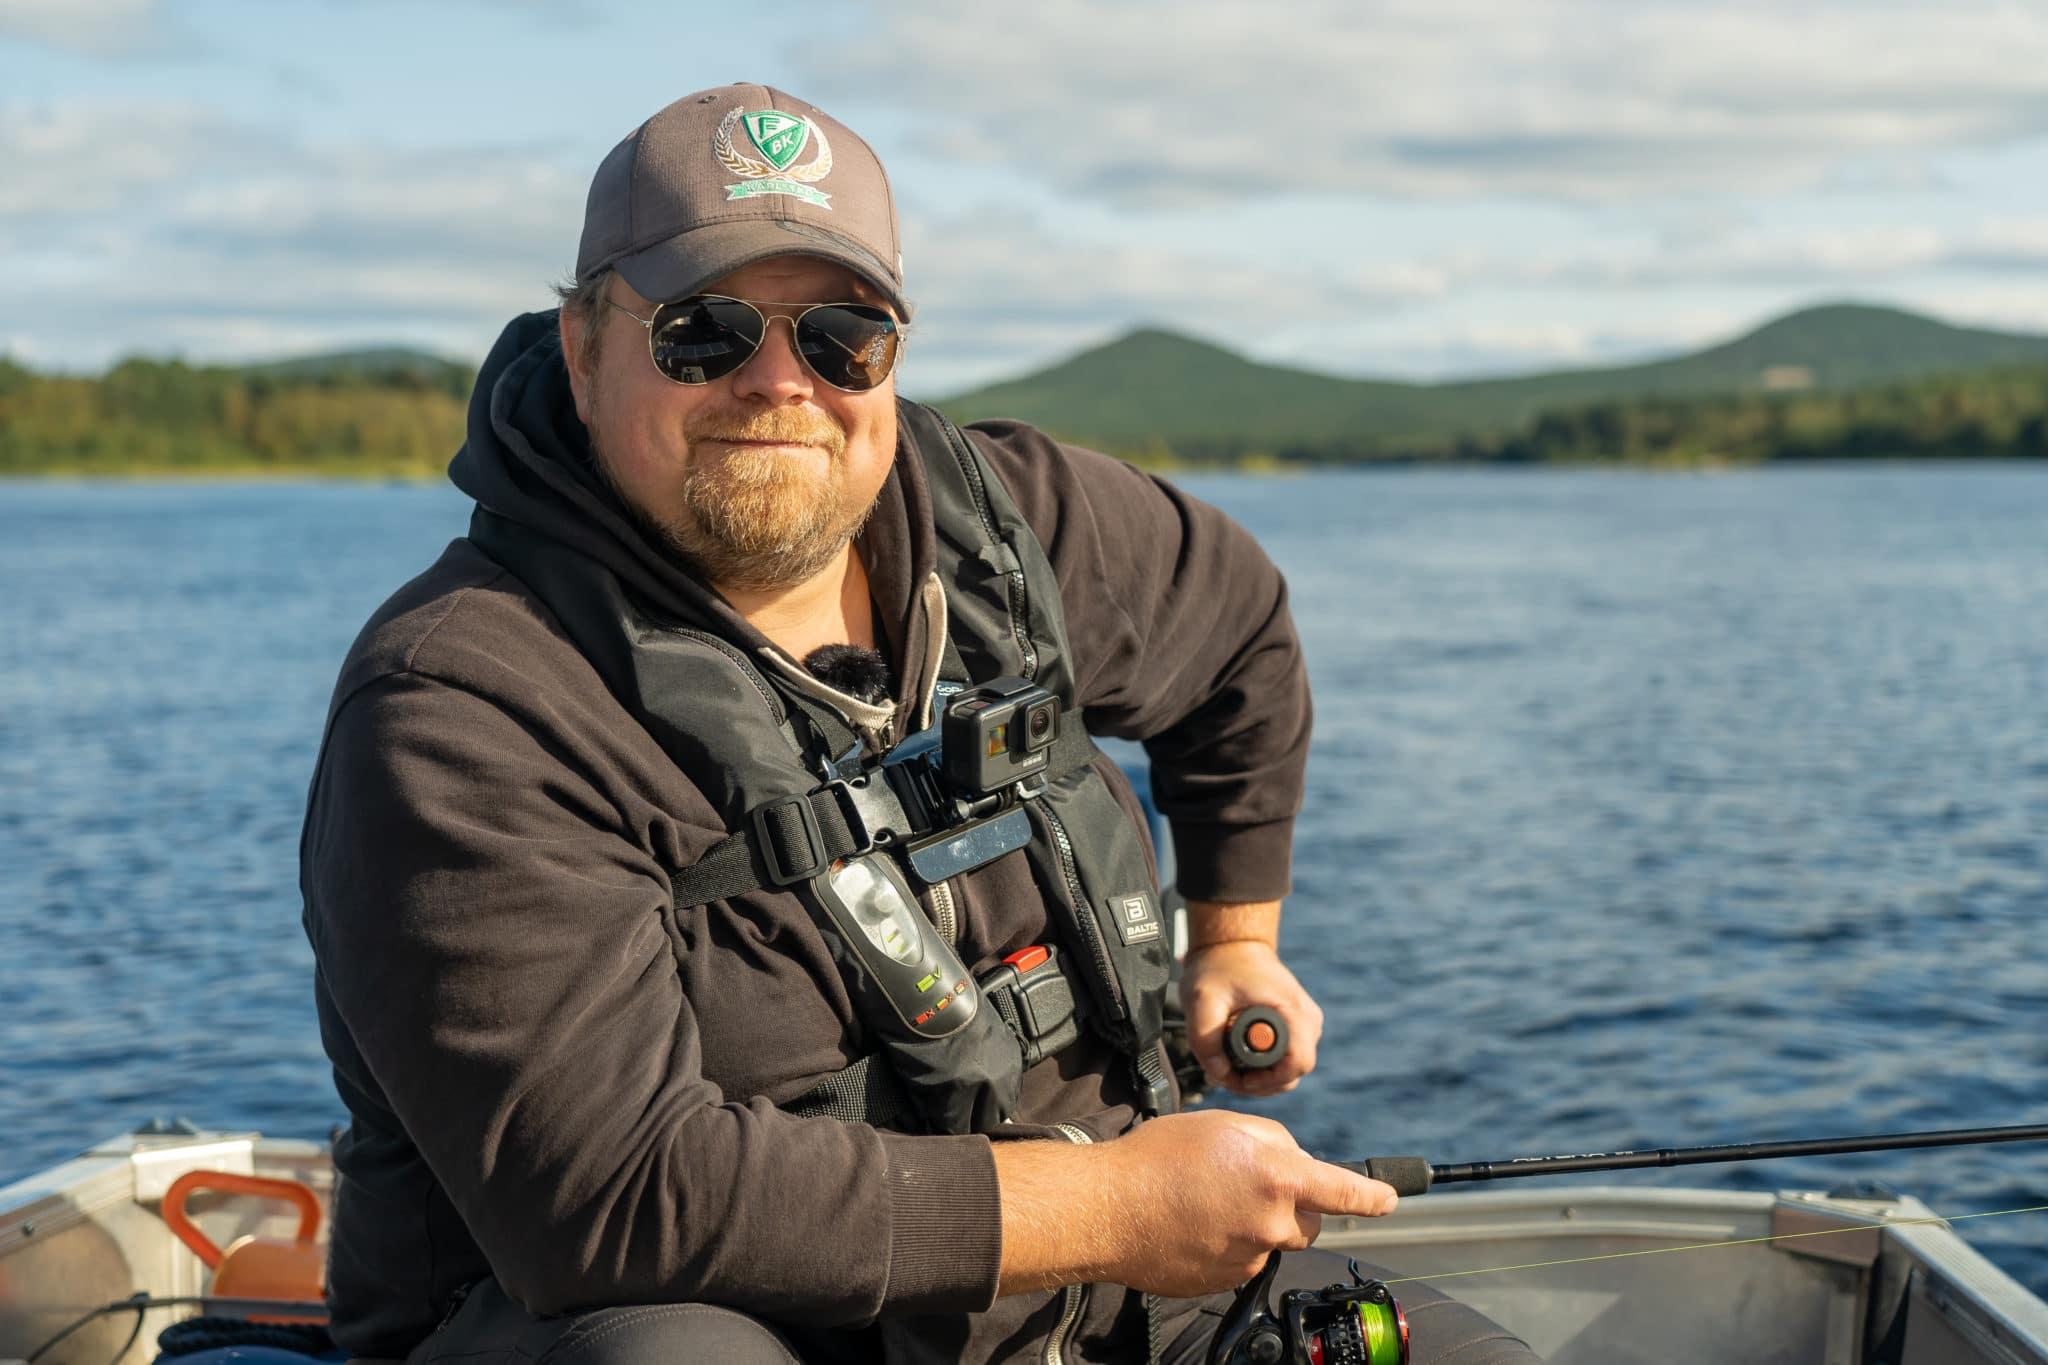 Jakten på landskapsfisken